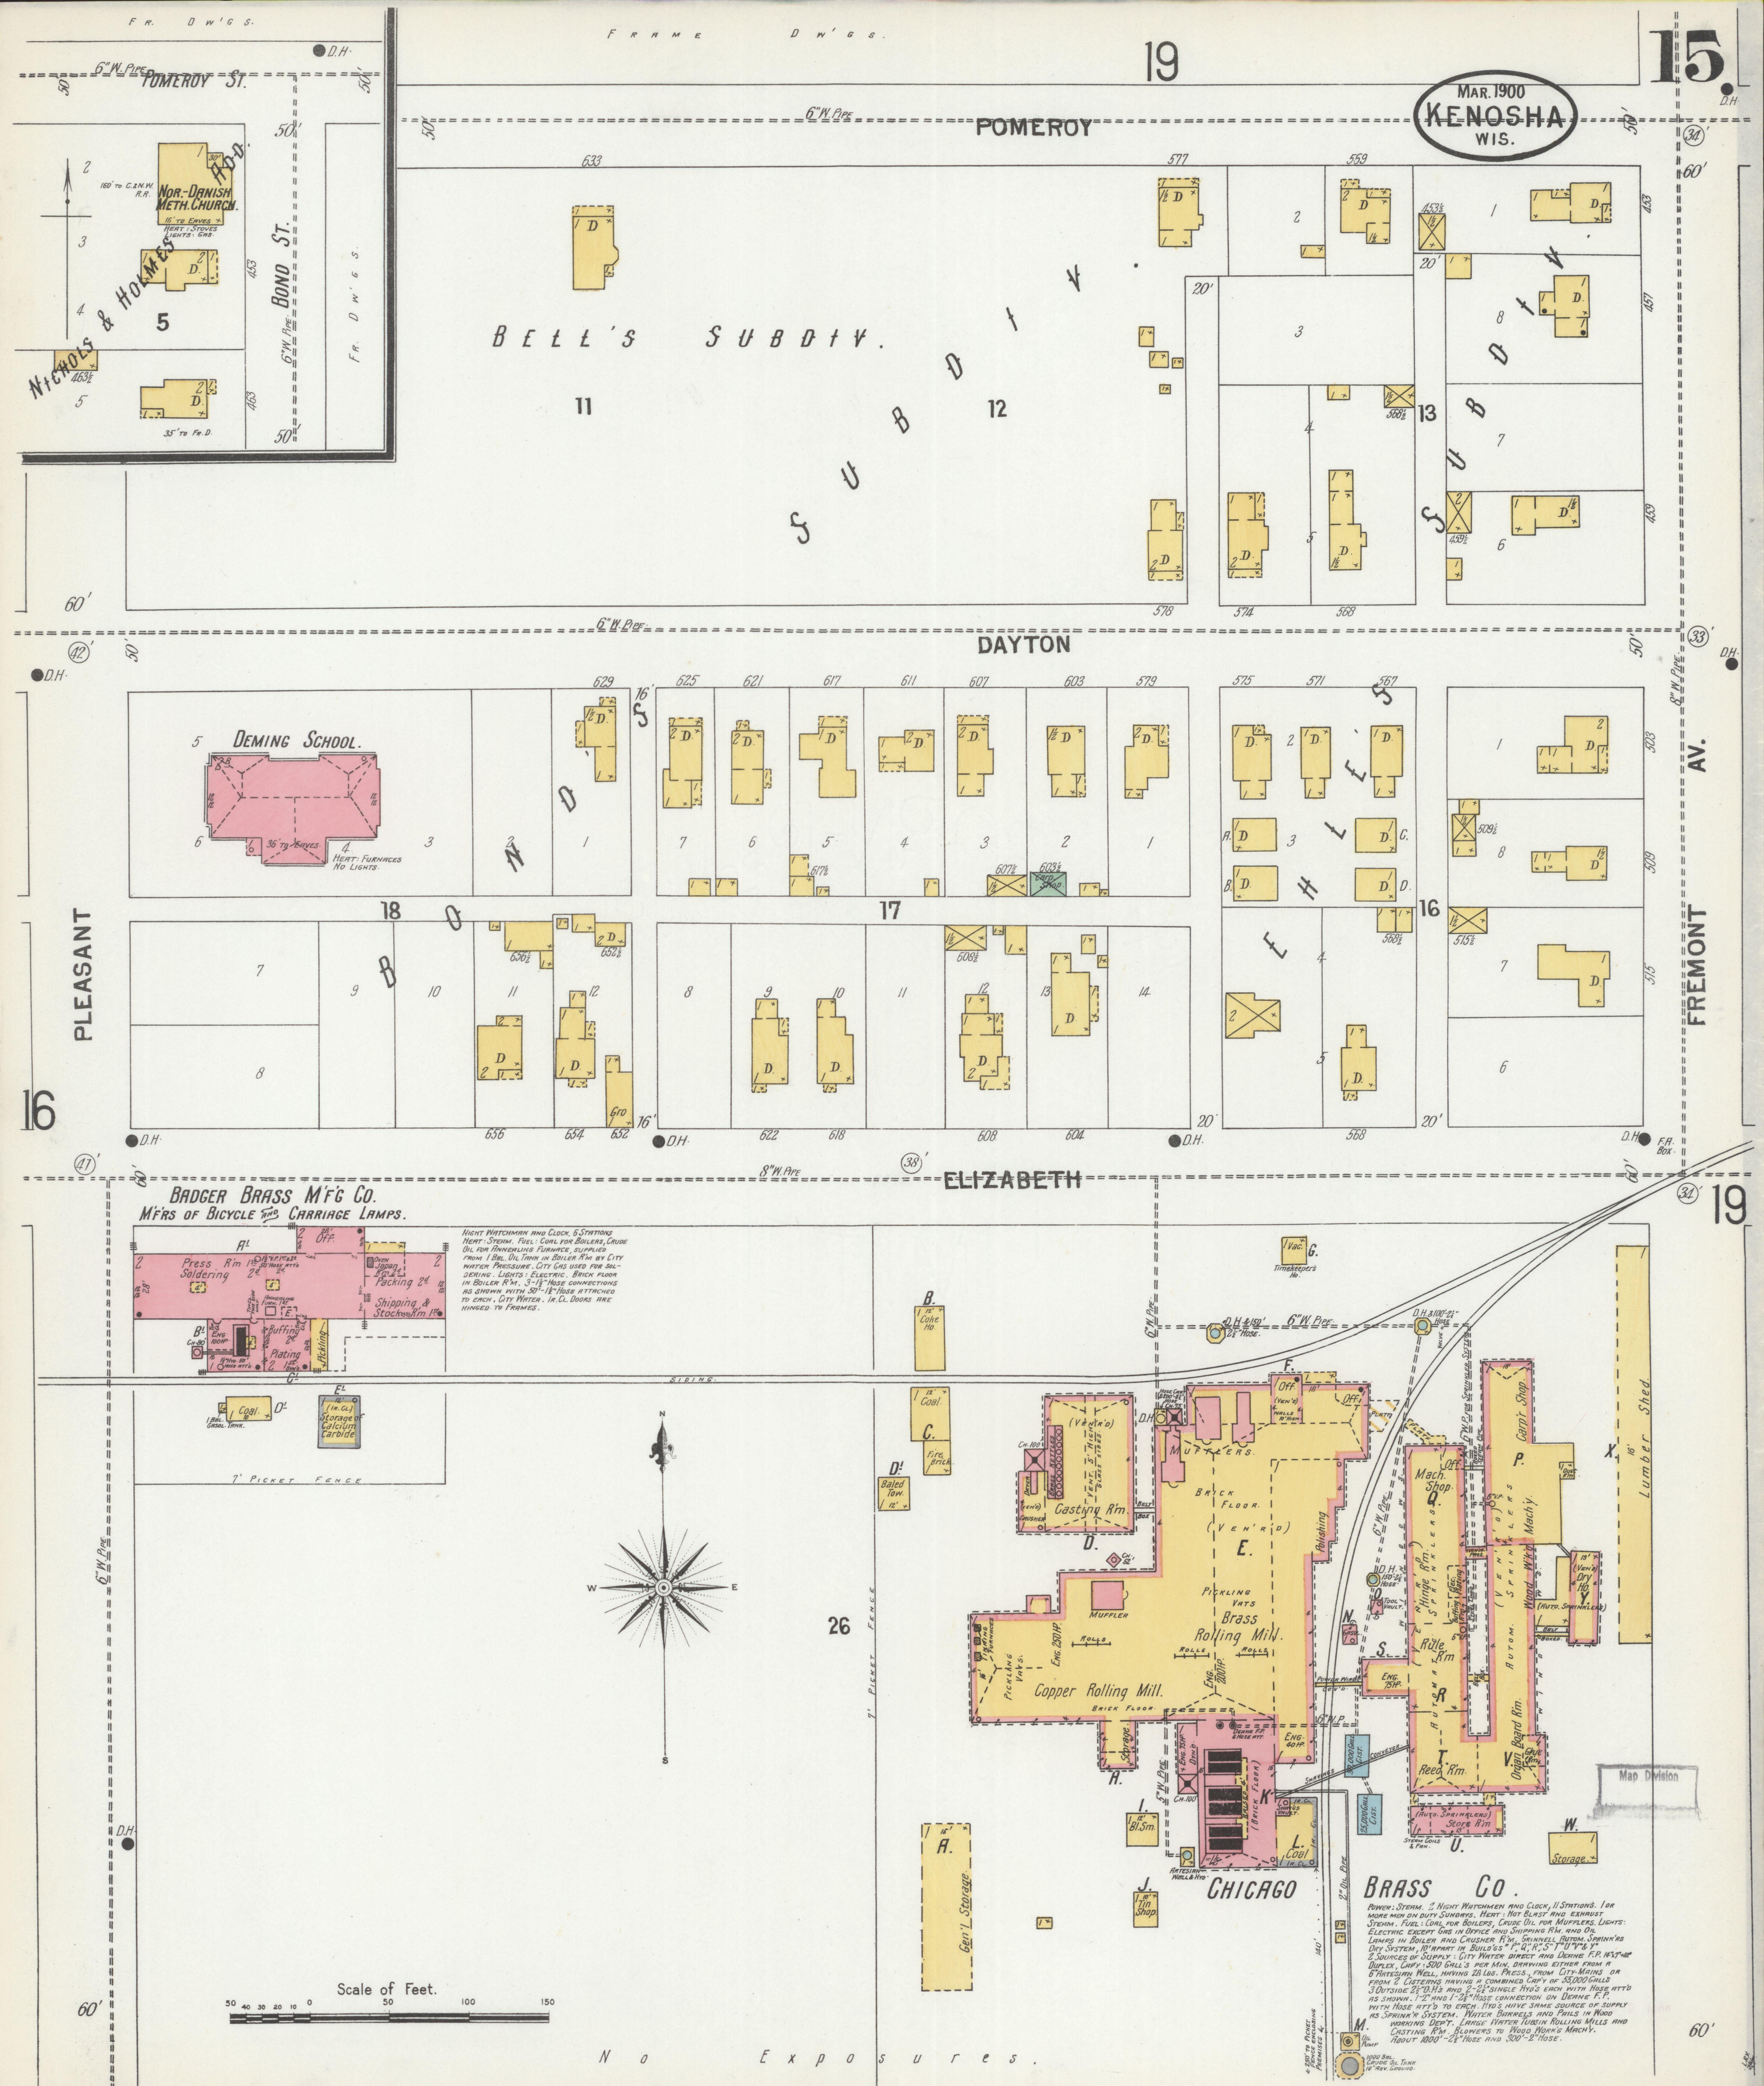 File:Sanborn Fire Insurance Map from Kenosha, Kenosha County ... on st francis map, door map, grand chute map, norman map, sheboygan map, woodstock map, fennimore map, prairie crossing map, superior map, fond du lac zip code map, racine wisconsin map, oconomowoc map, waukesha map, schererville map, lafayette map, greensboro map, city of racine map, wilmot map, wausau map, peoria map,